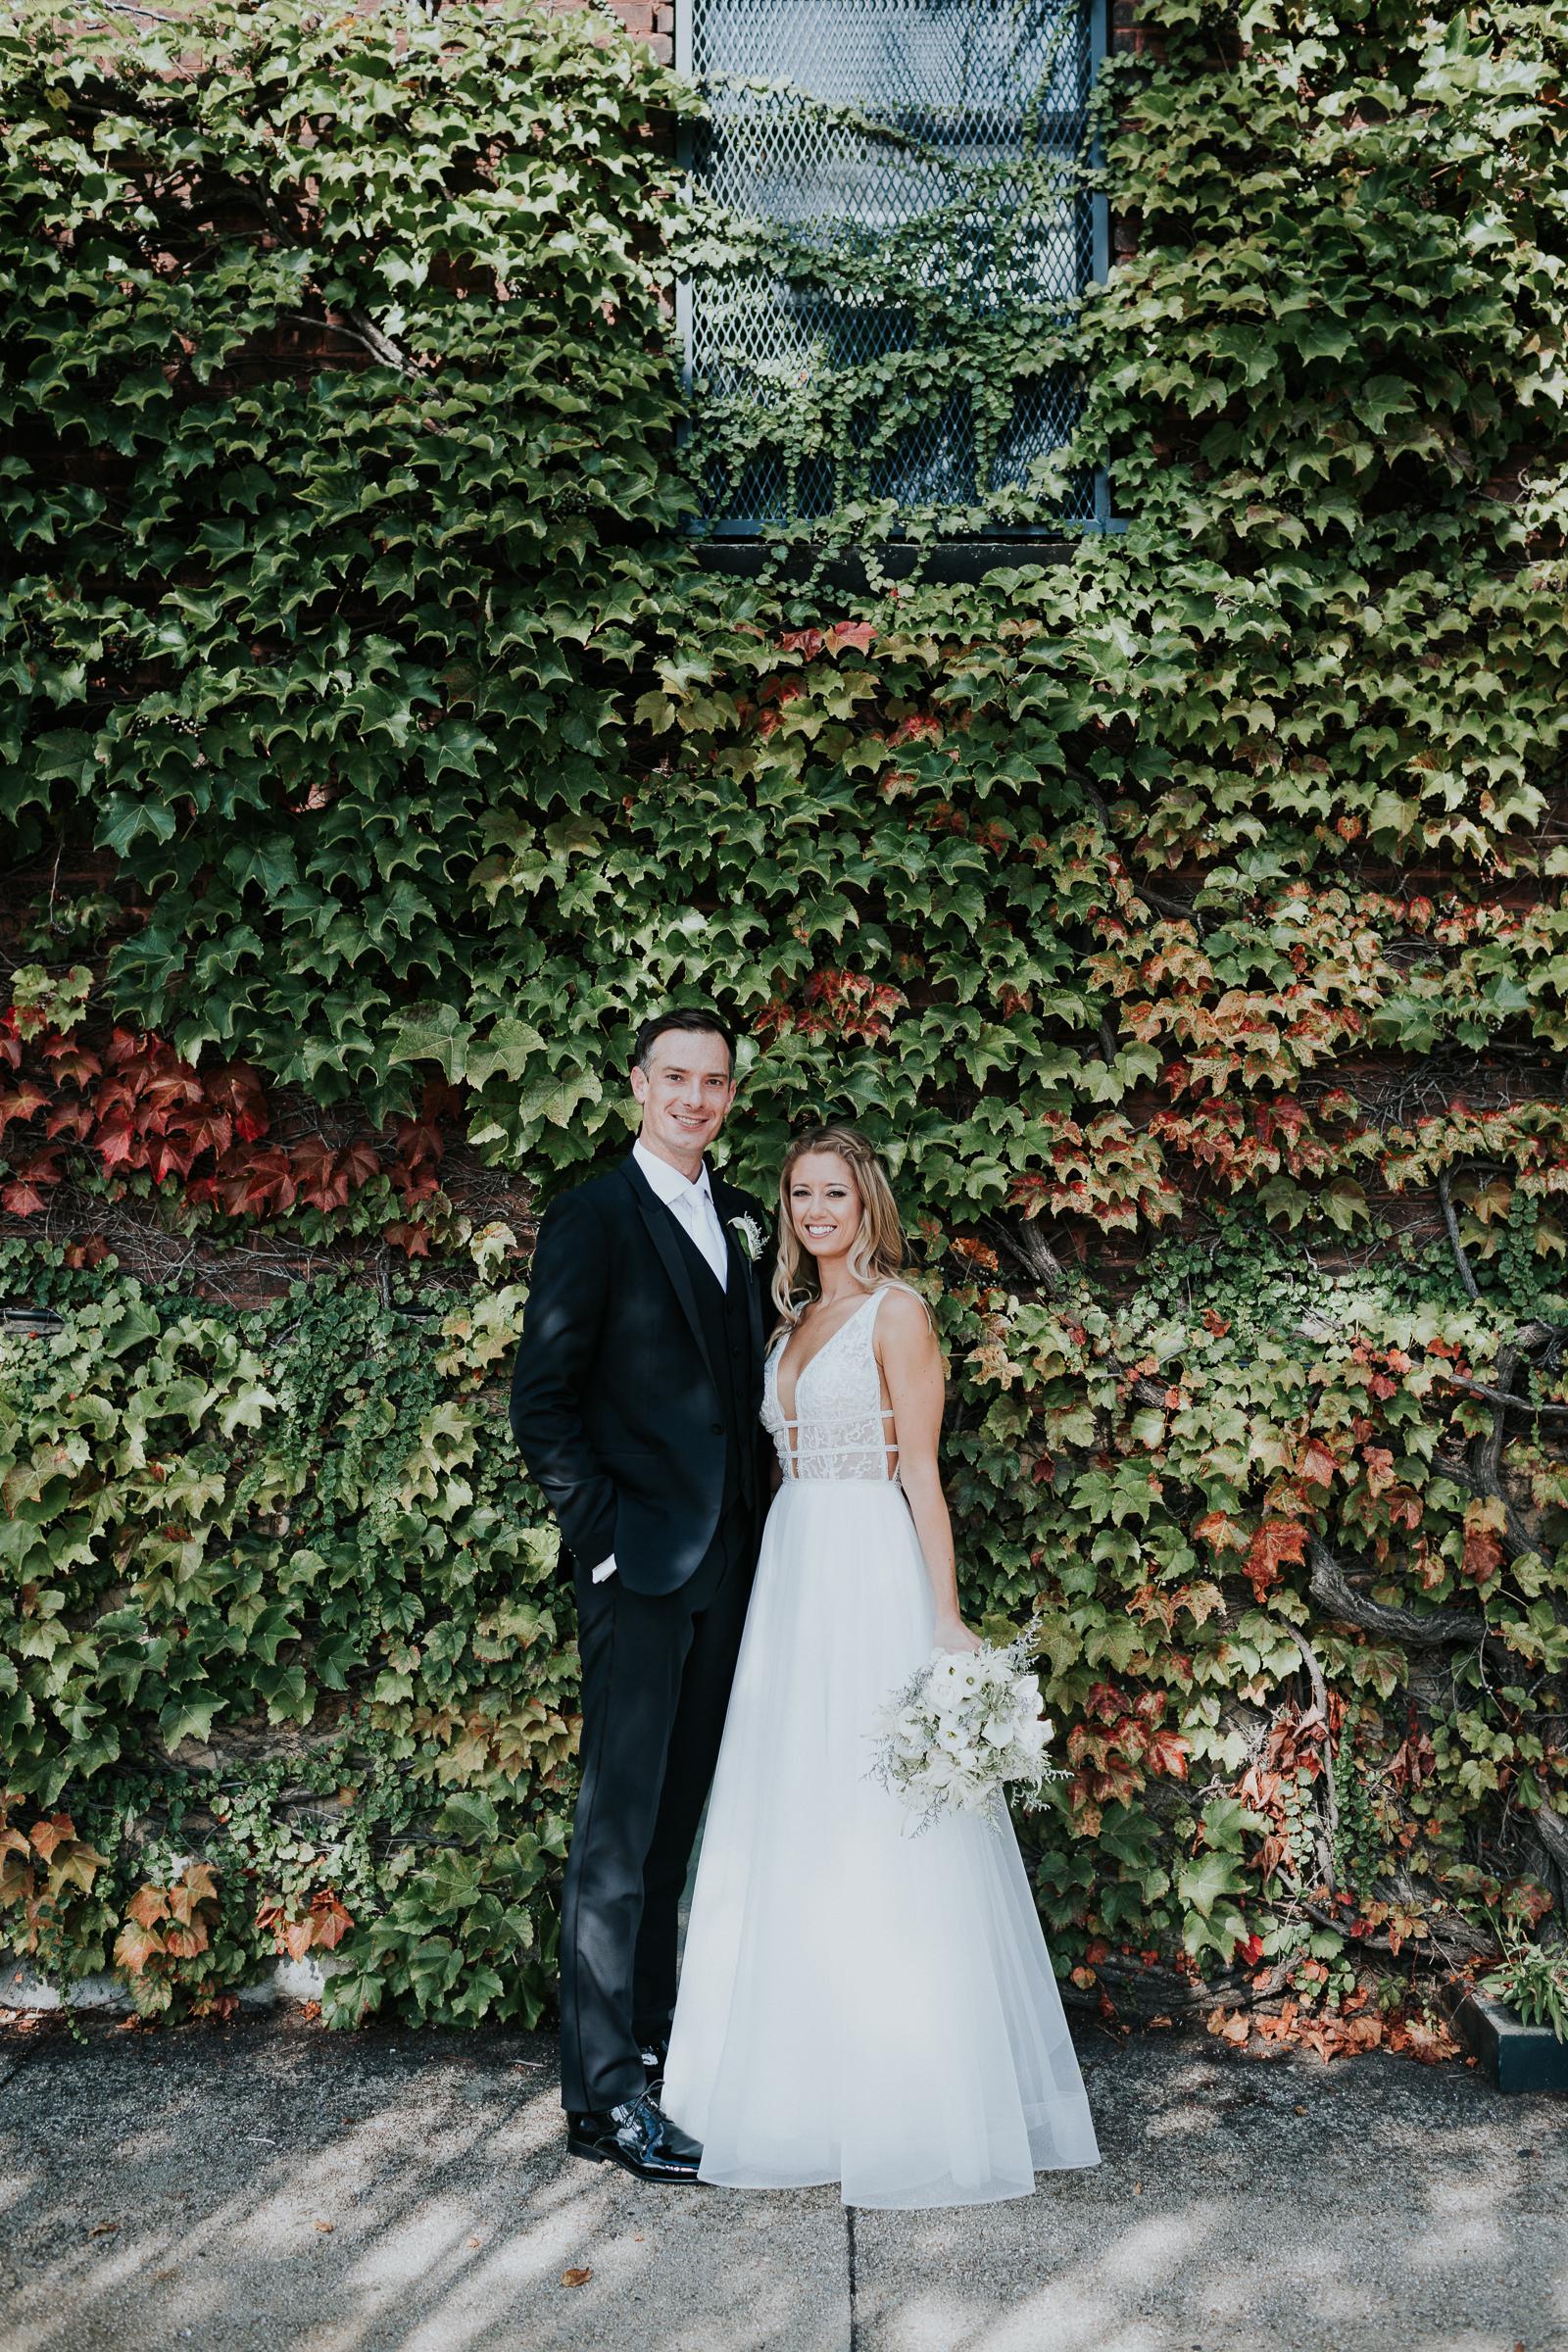 Ravel-Hotel-Penthouse-808-Long-Island-City-New-York-Documentary-Wedding-Photographer-36.jpg